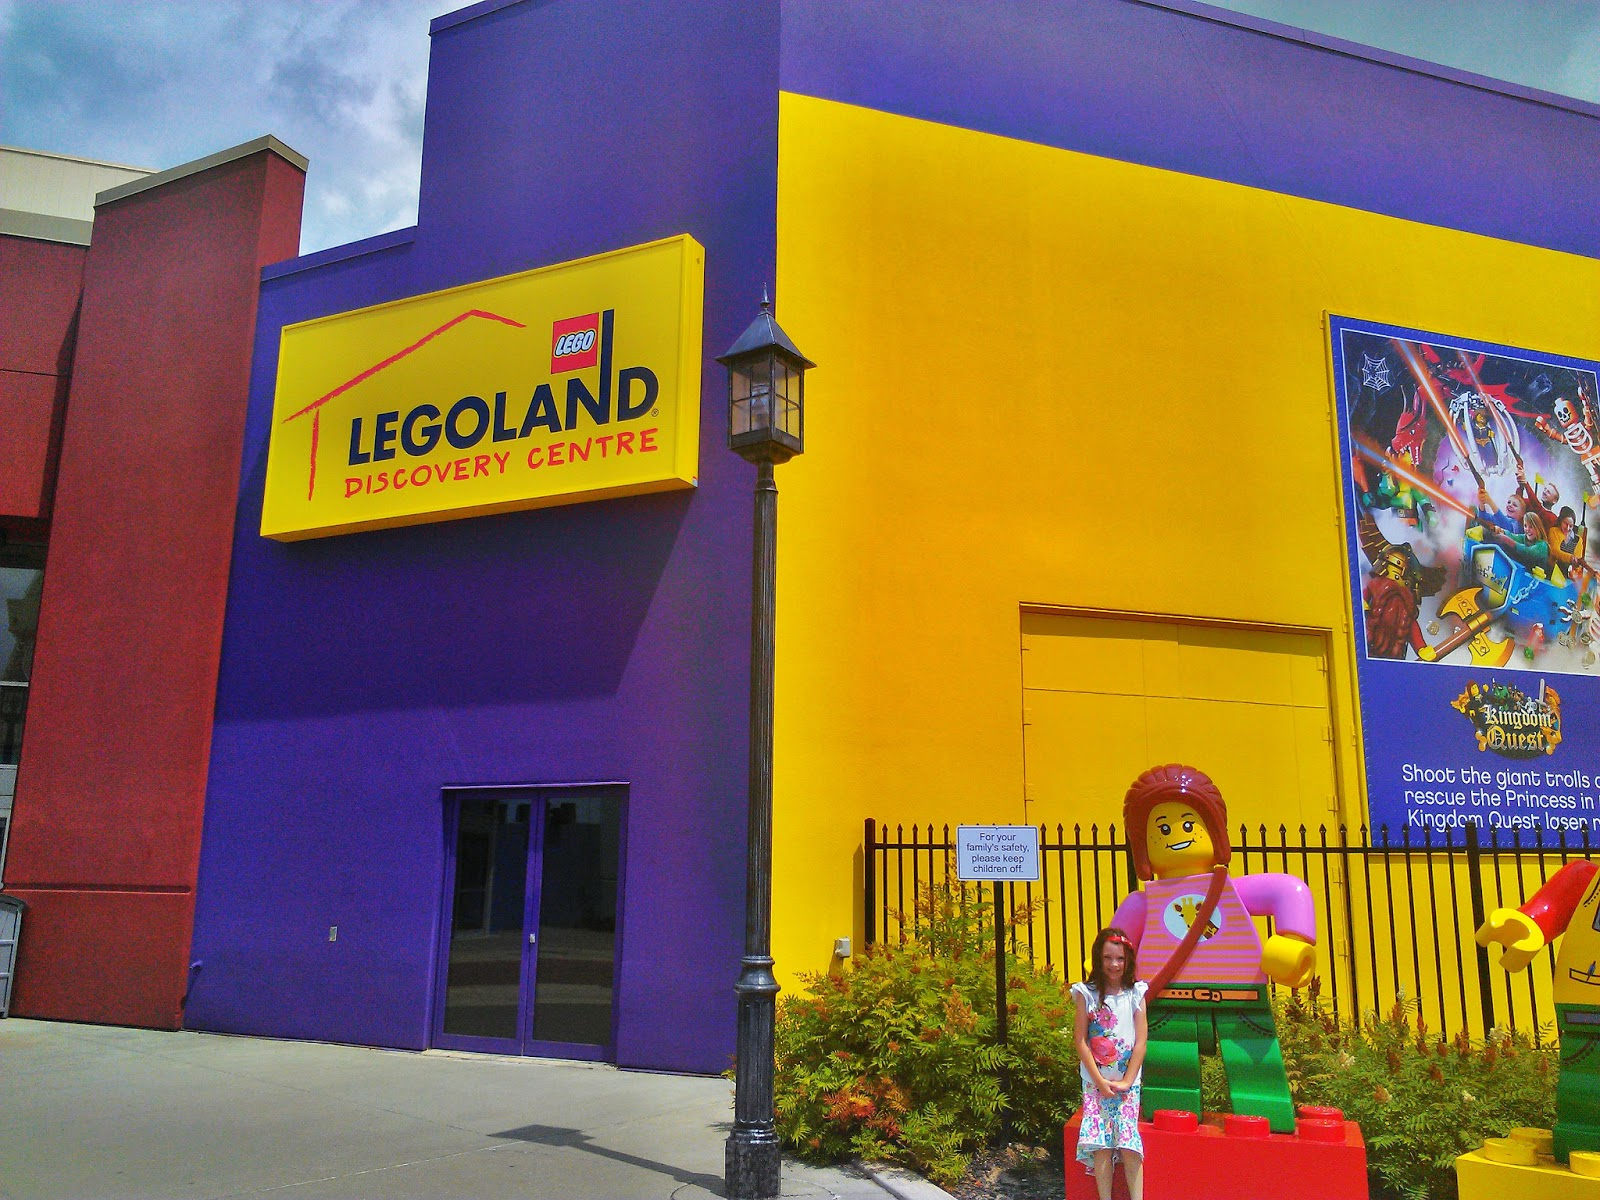 Blondie's Blog: Legoland Discovery Centre Toronto